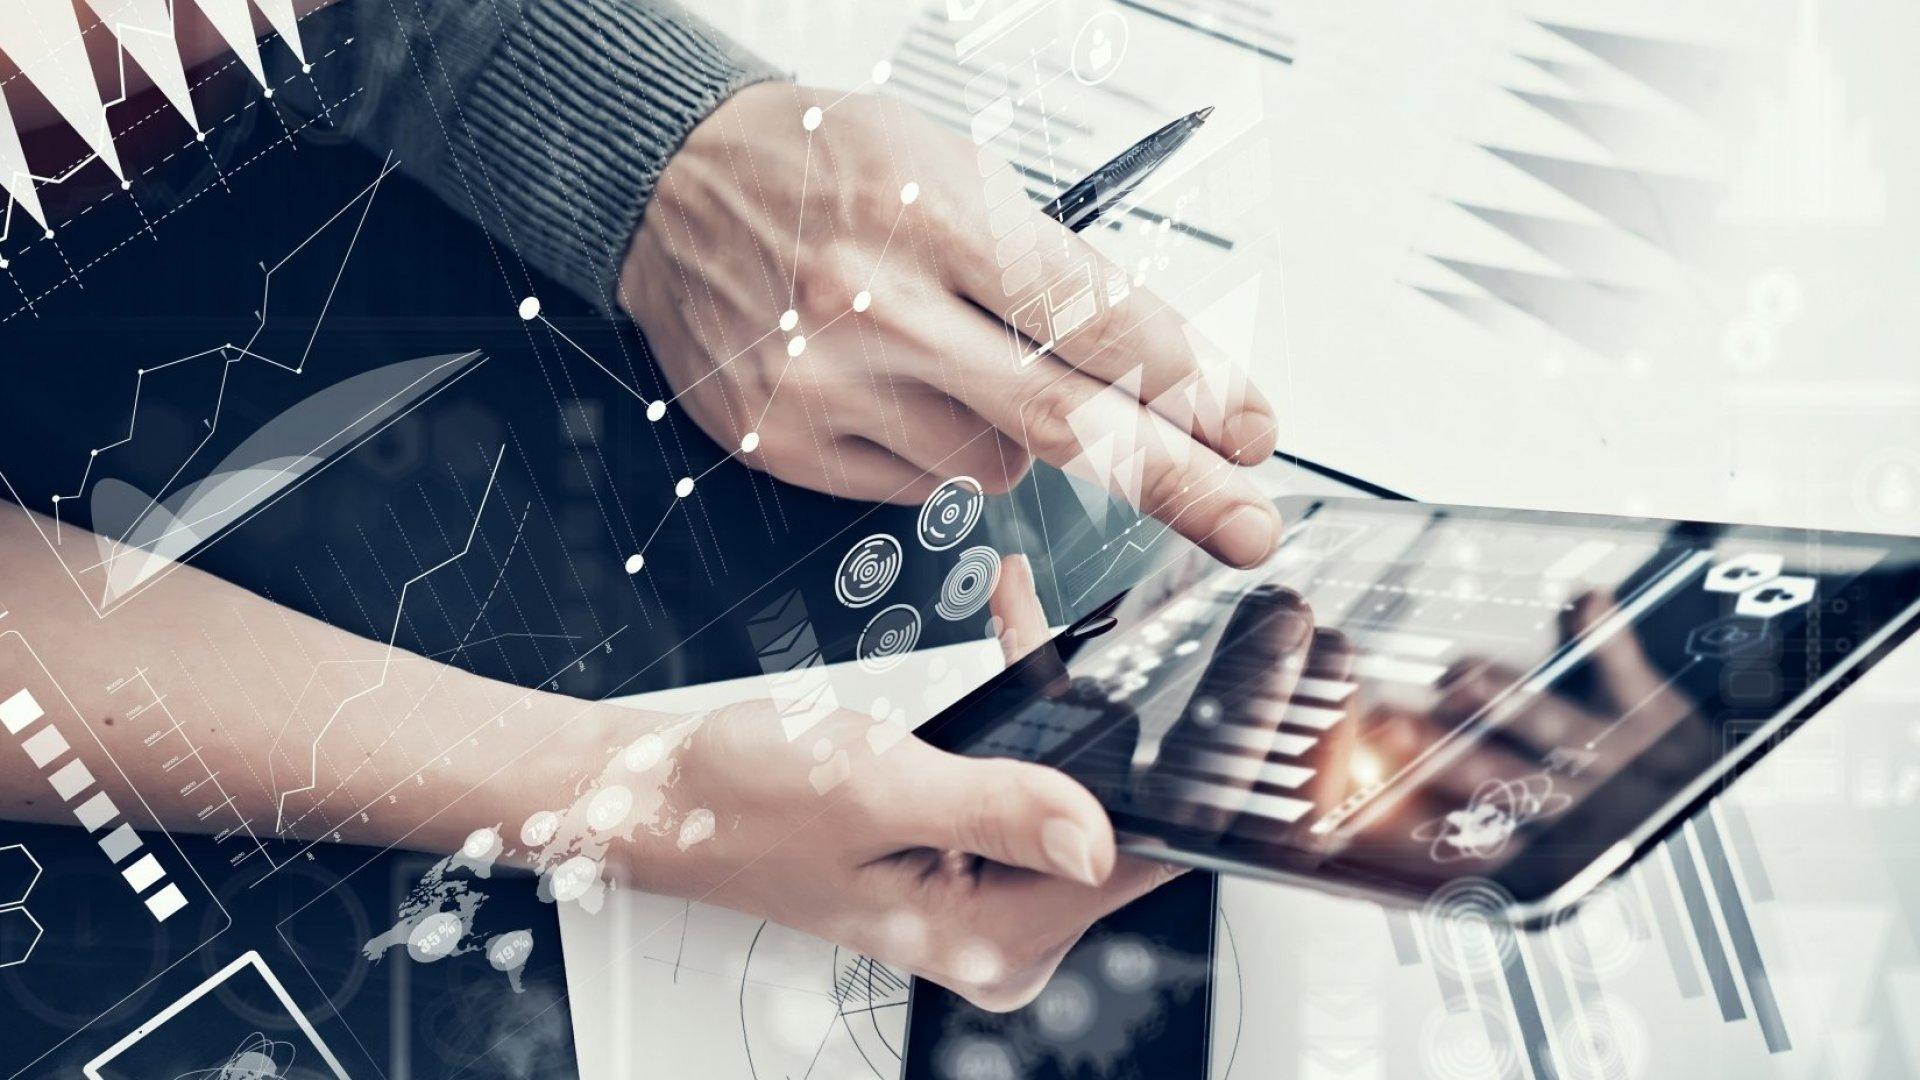 20 Tech Innovators to Watch in 2018